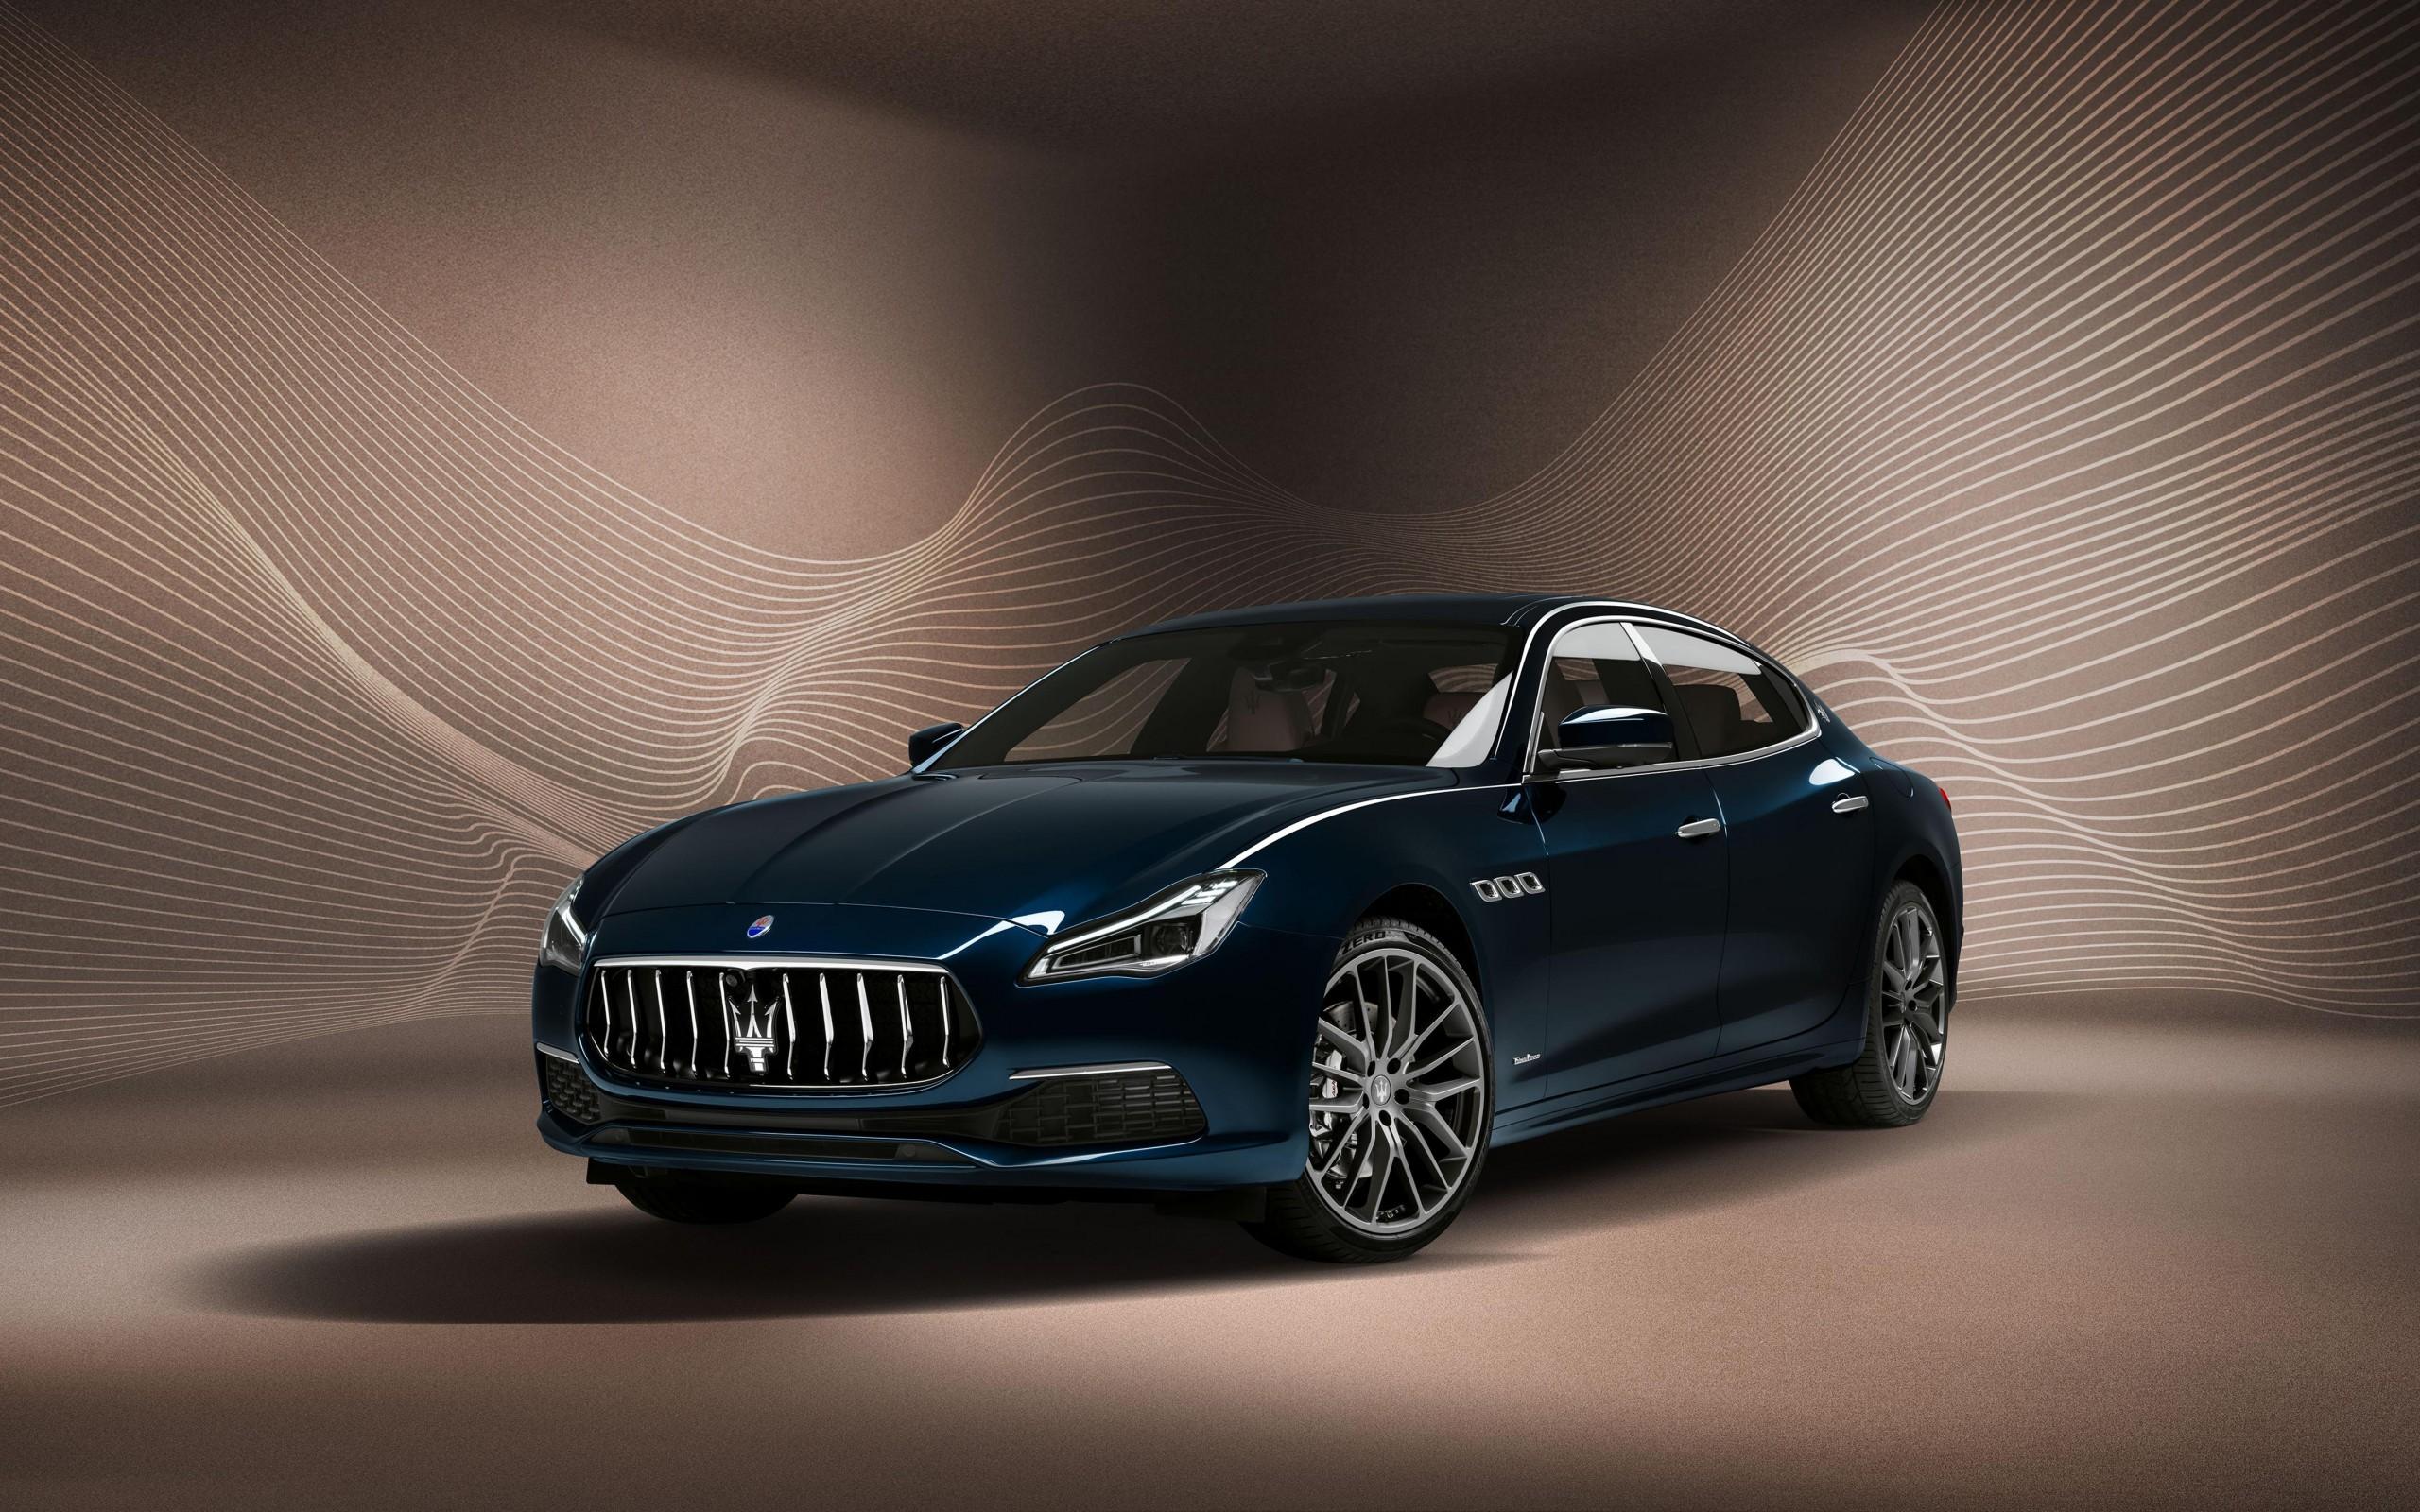 Maserati Quattroporte GranLusso Royale 2020 5K HD desktop 2560x1600